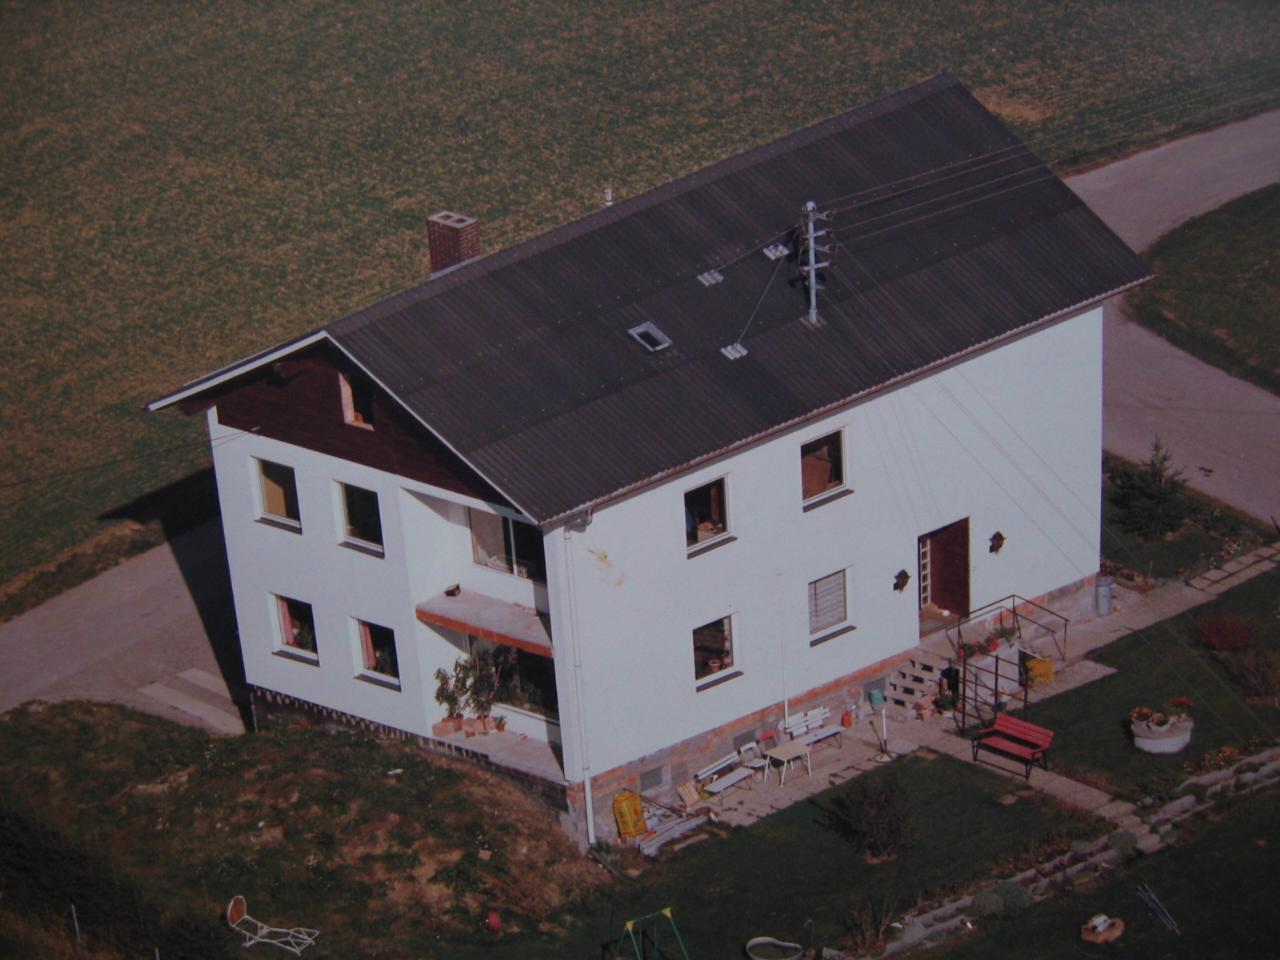 http://www.energiesparhaus.at/bilderupload2016/20161020600479.jpg